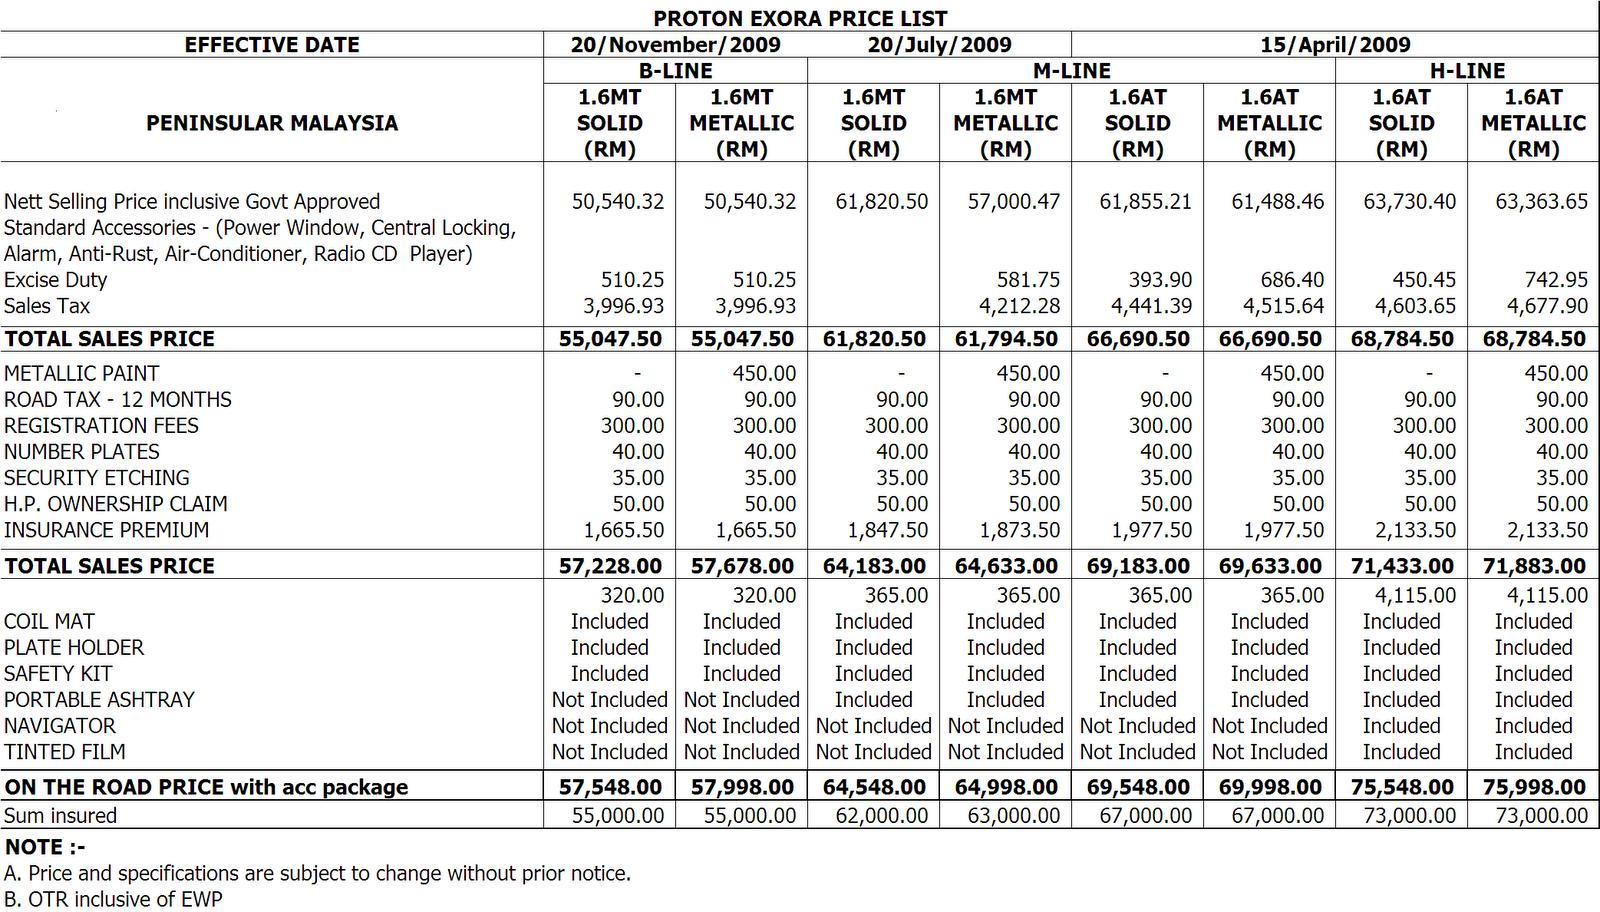 Proton Exora Price List As On June 2013 | Upcomingcarshq.com